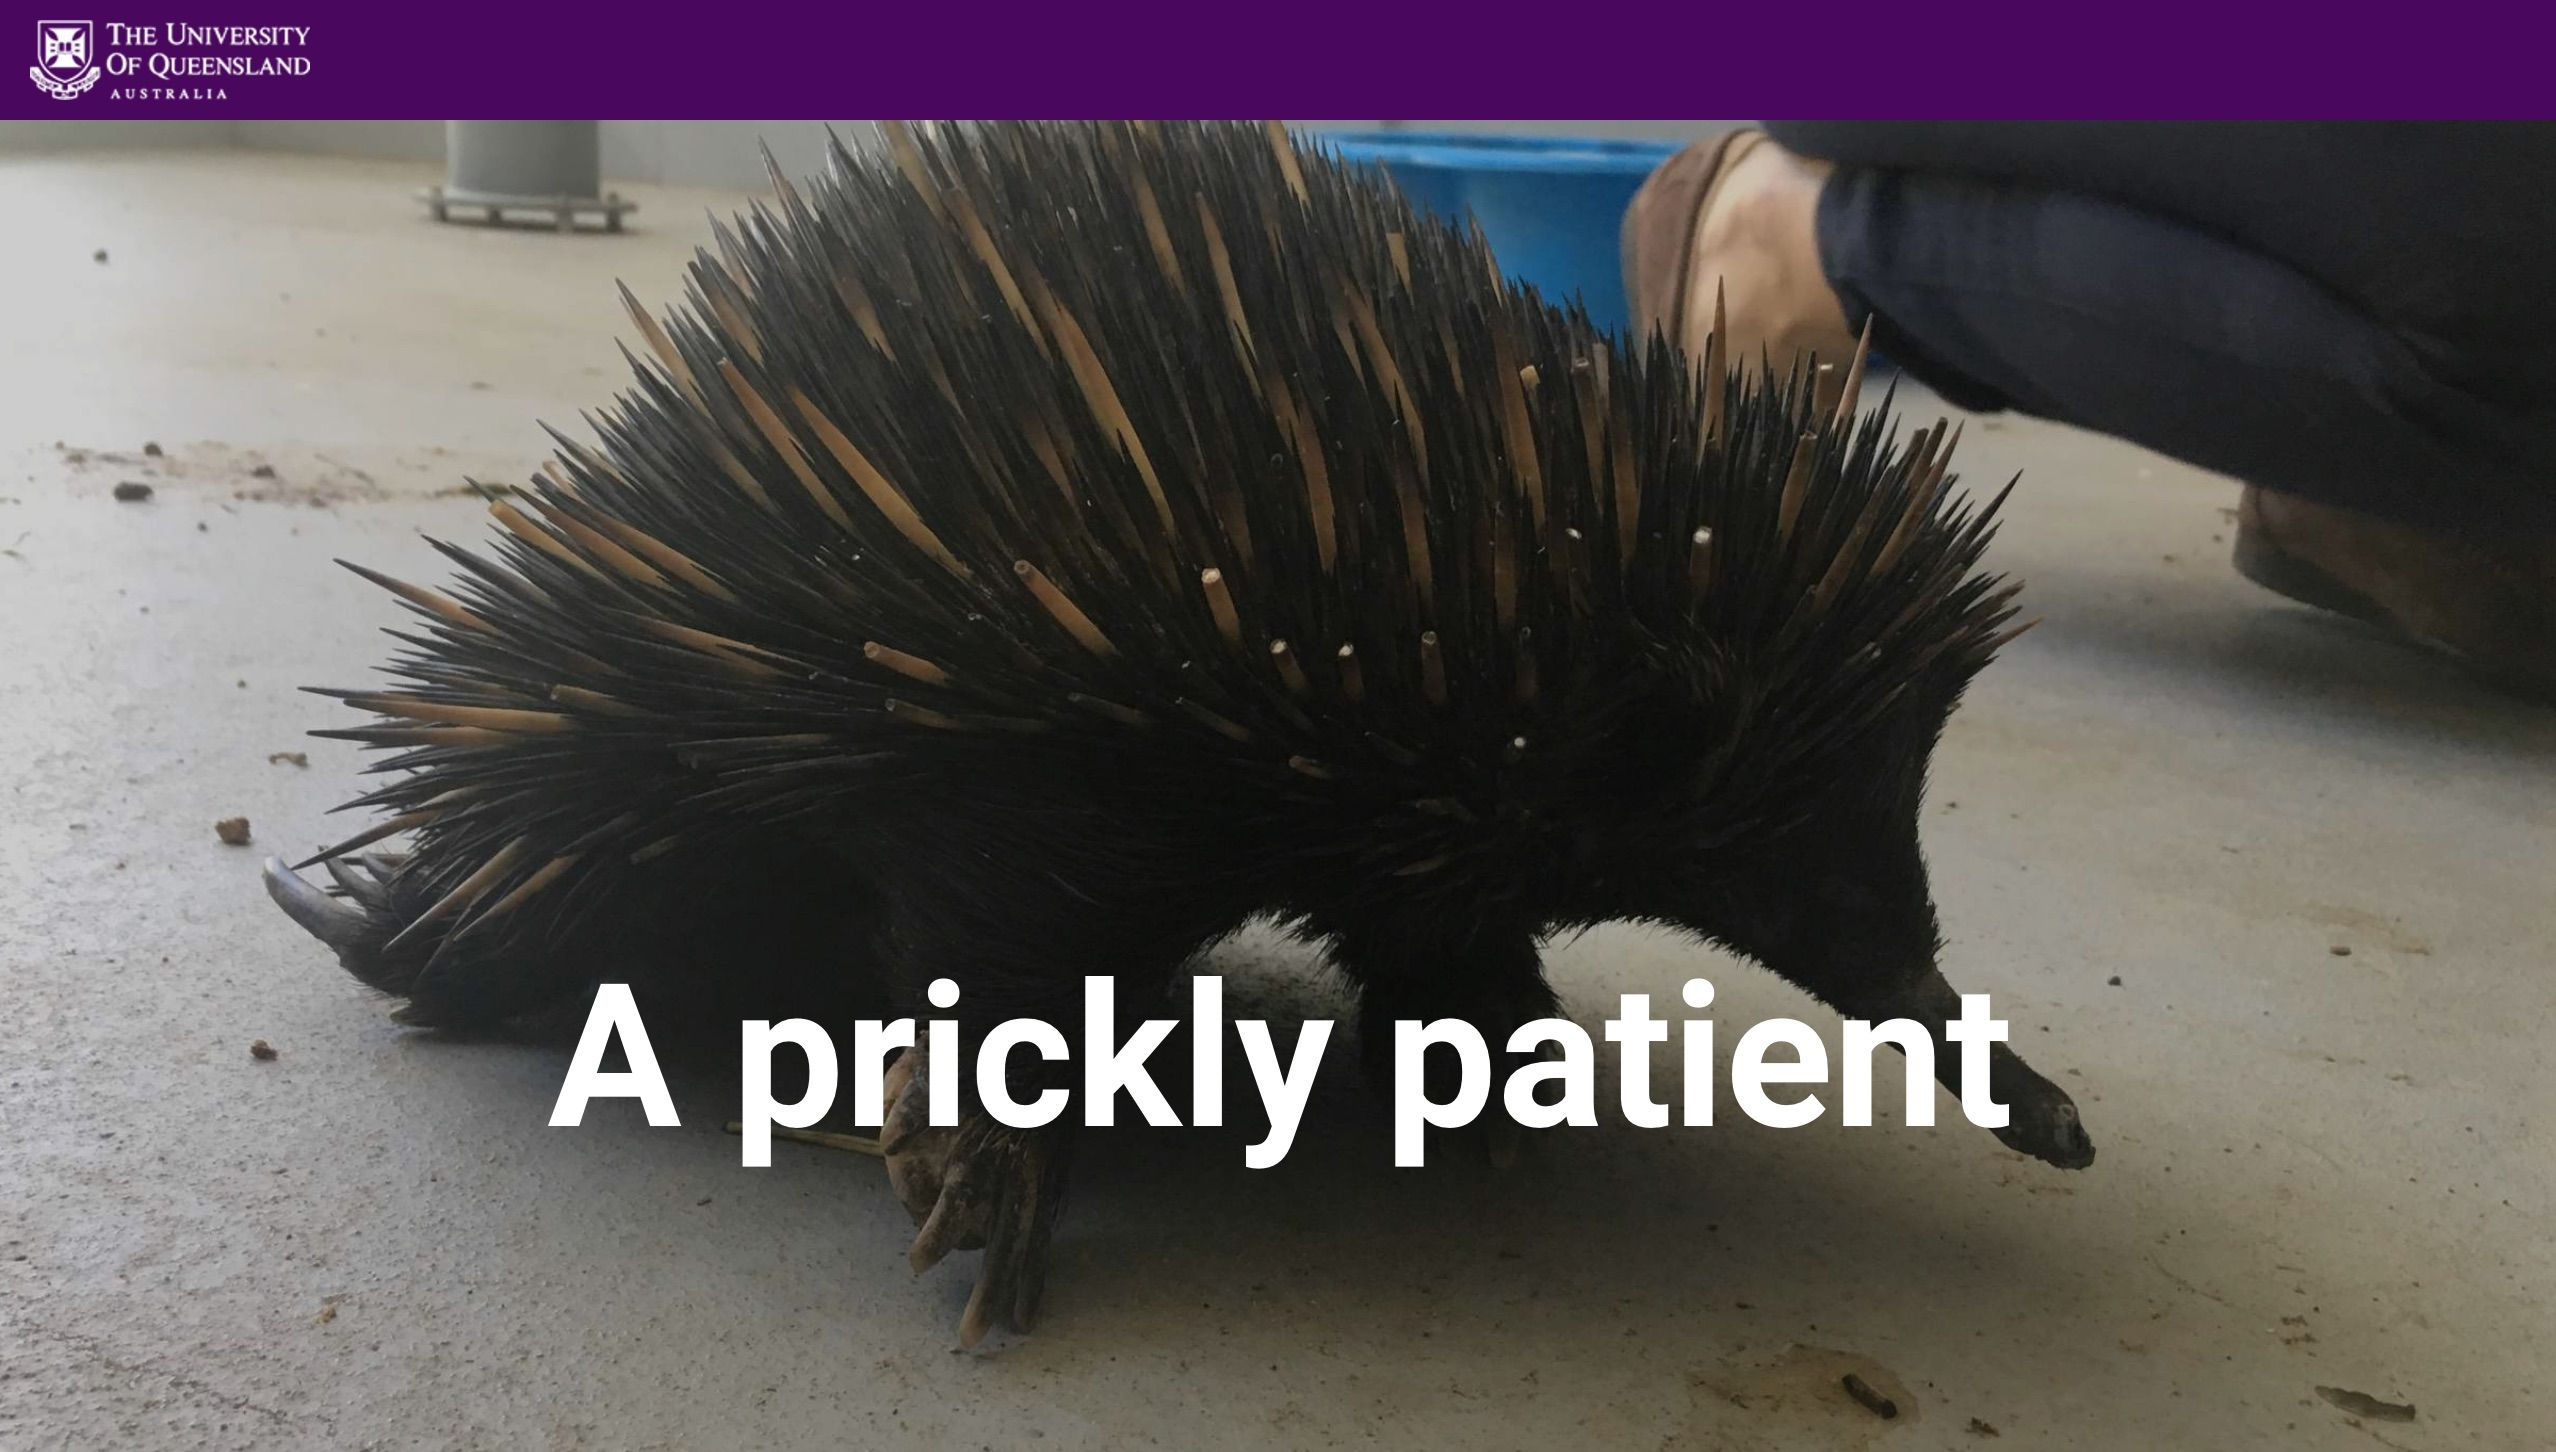 A prickly patient, UQ